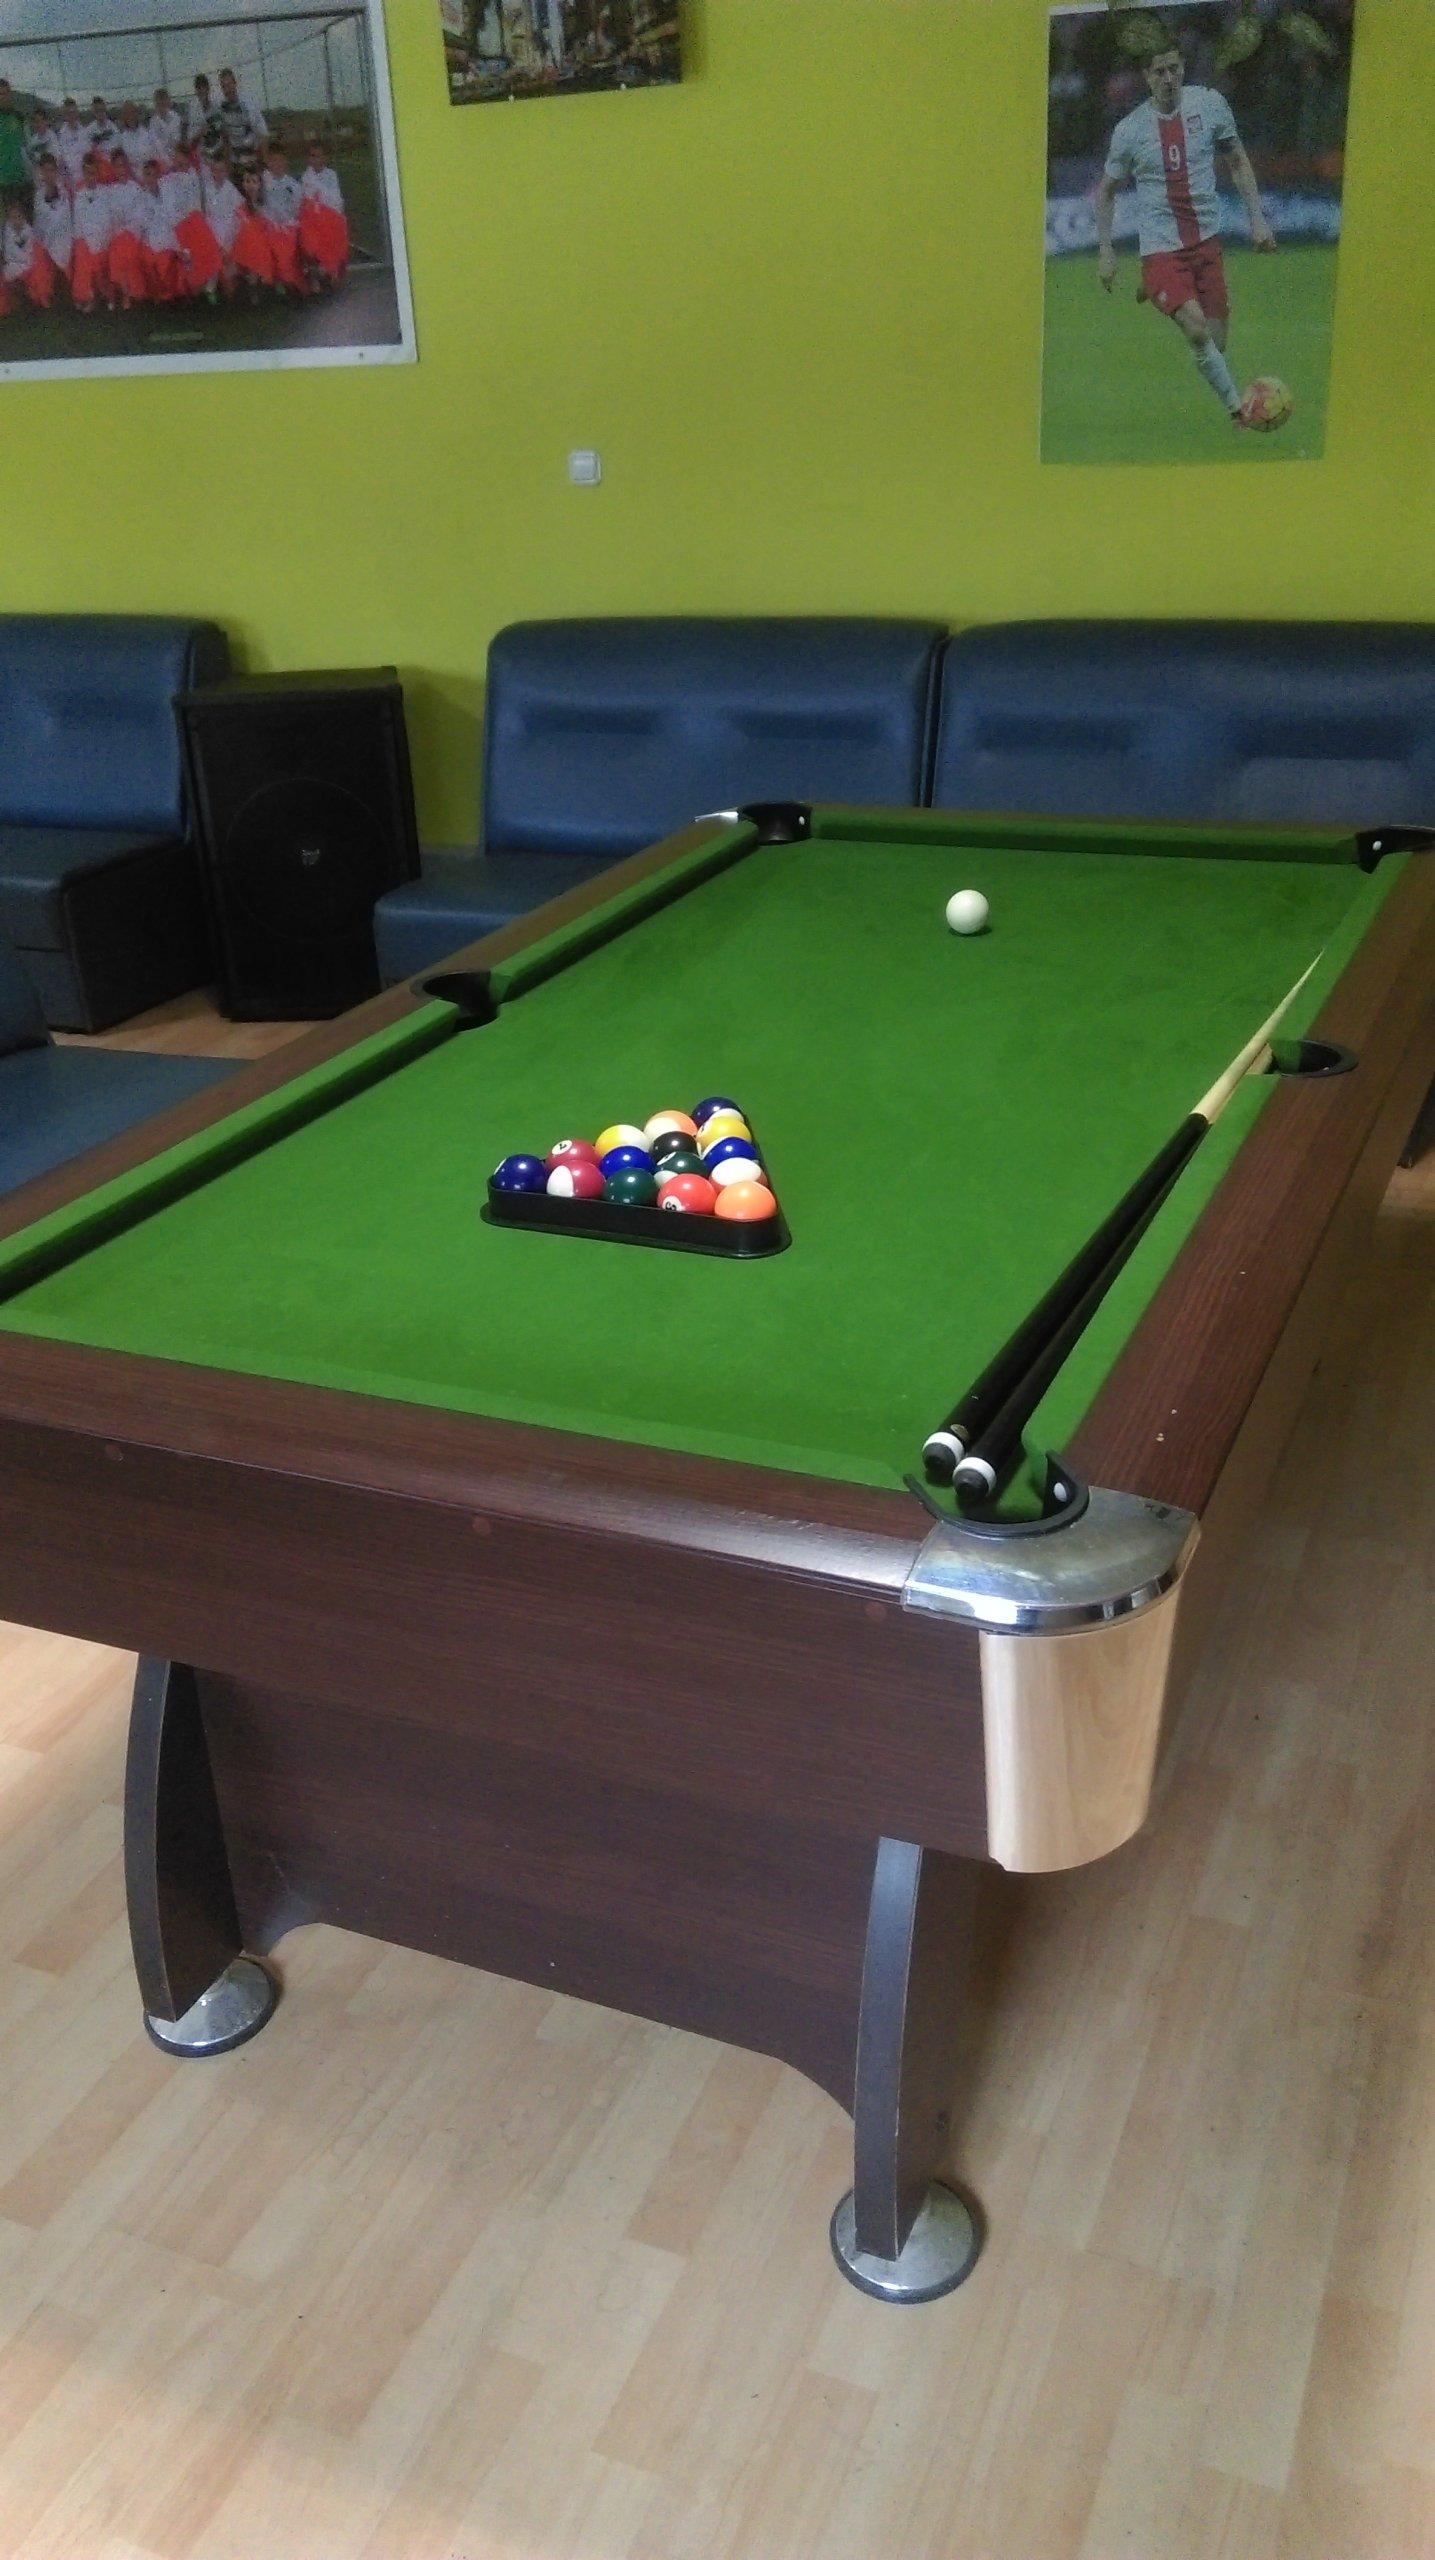 Stół Bilardowy 7ft Cymbergaj Ping Pong 7024691765